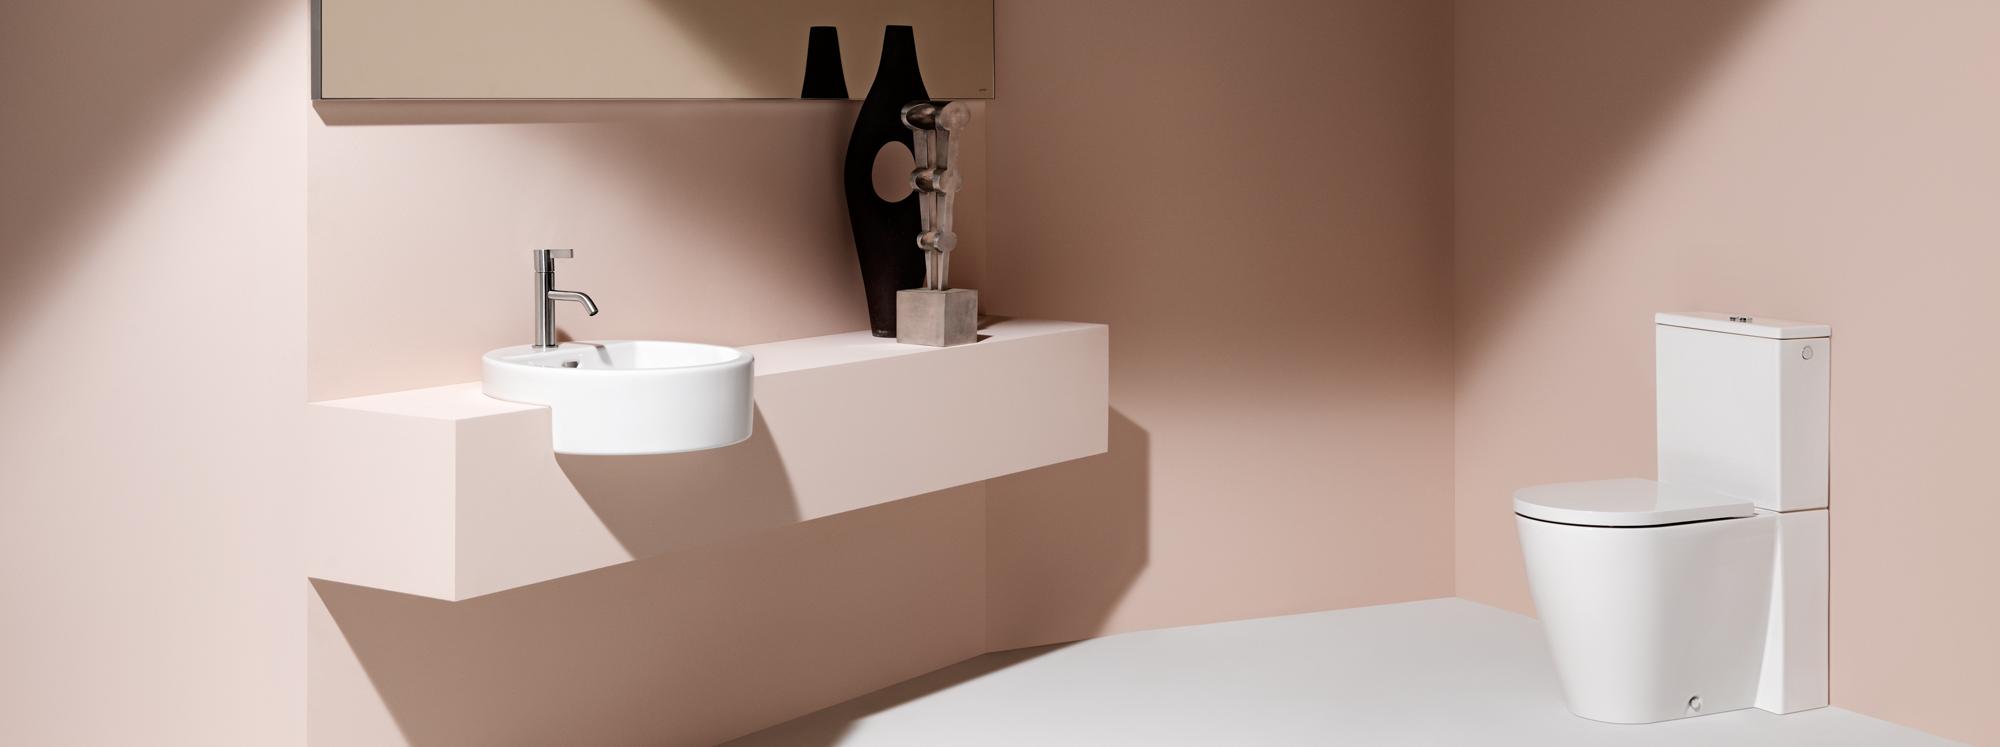 HOME | LAUFEN Bathrooms | Laufen Outline Flying Logo Design Bathroom on glass door design outline, interior design outline, kitchen design outline,